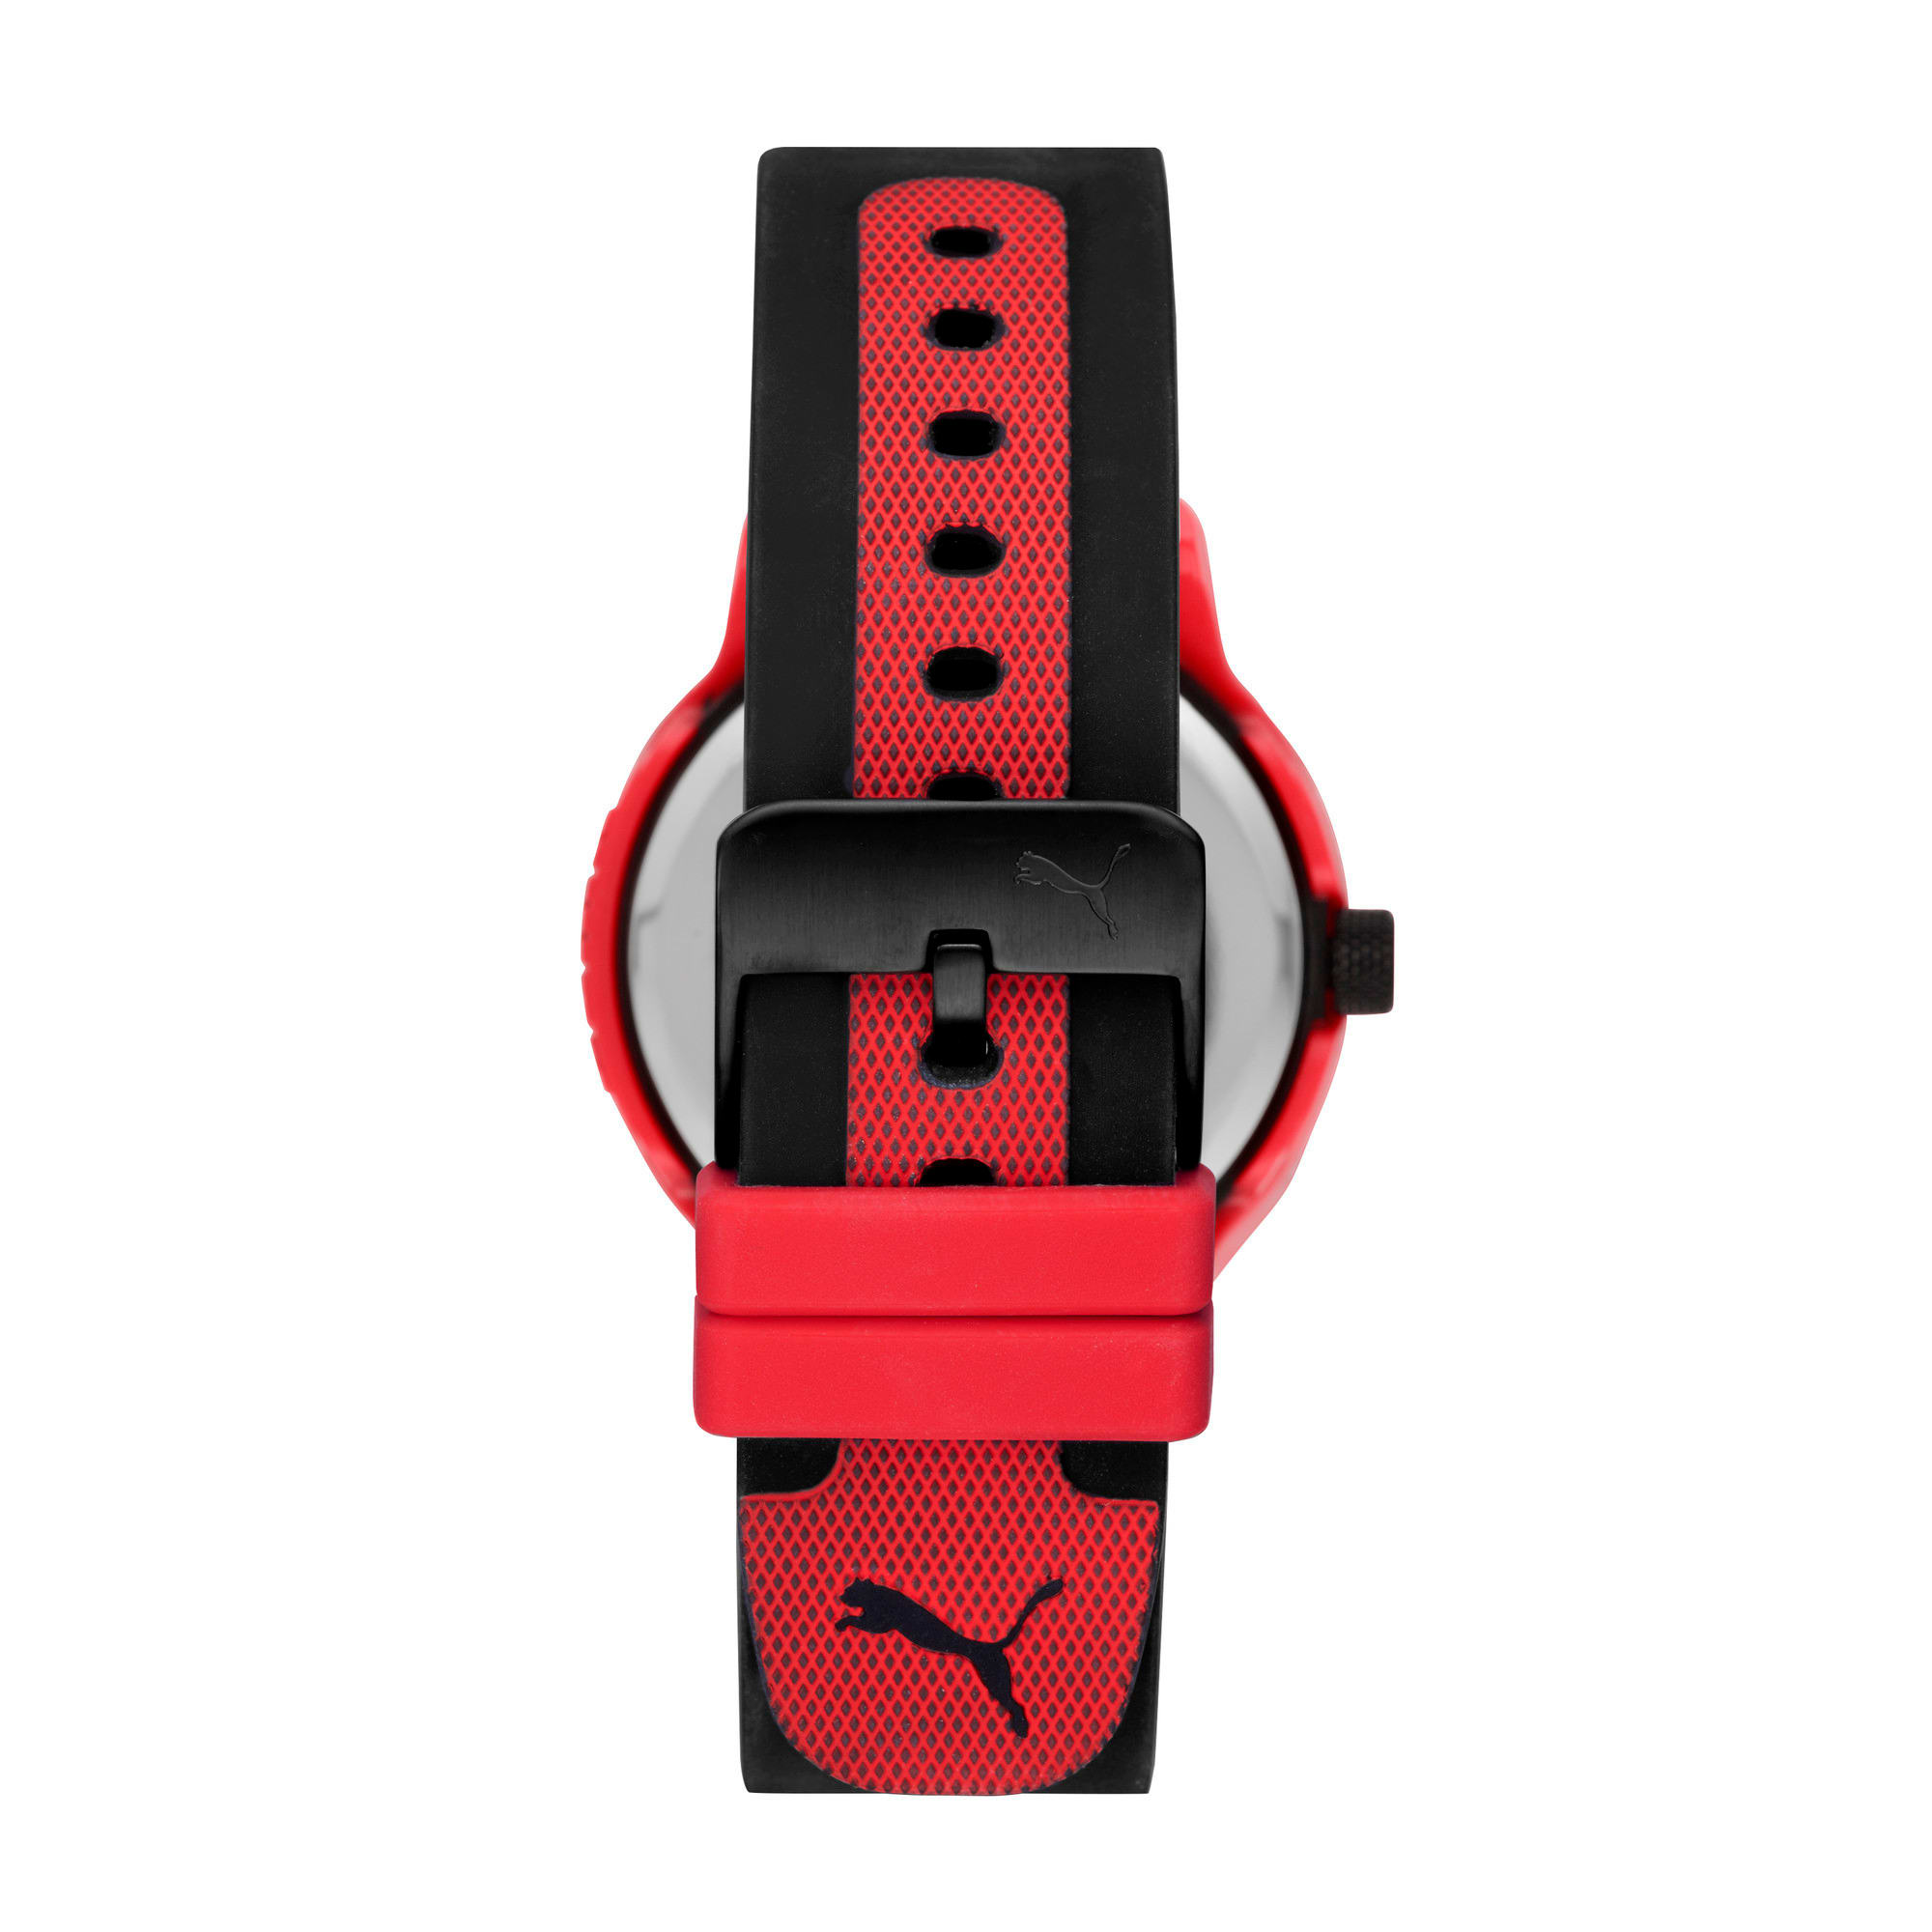 Thumbnail 2 of Reset v1 Watch, Red/Black, medium